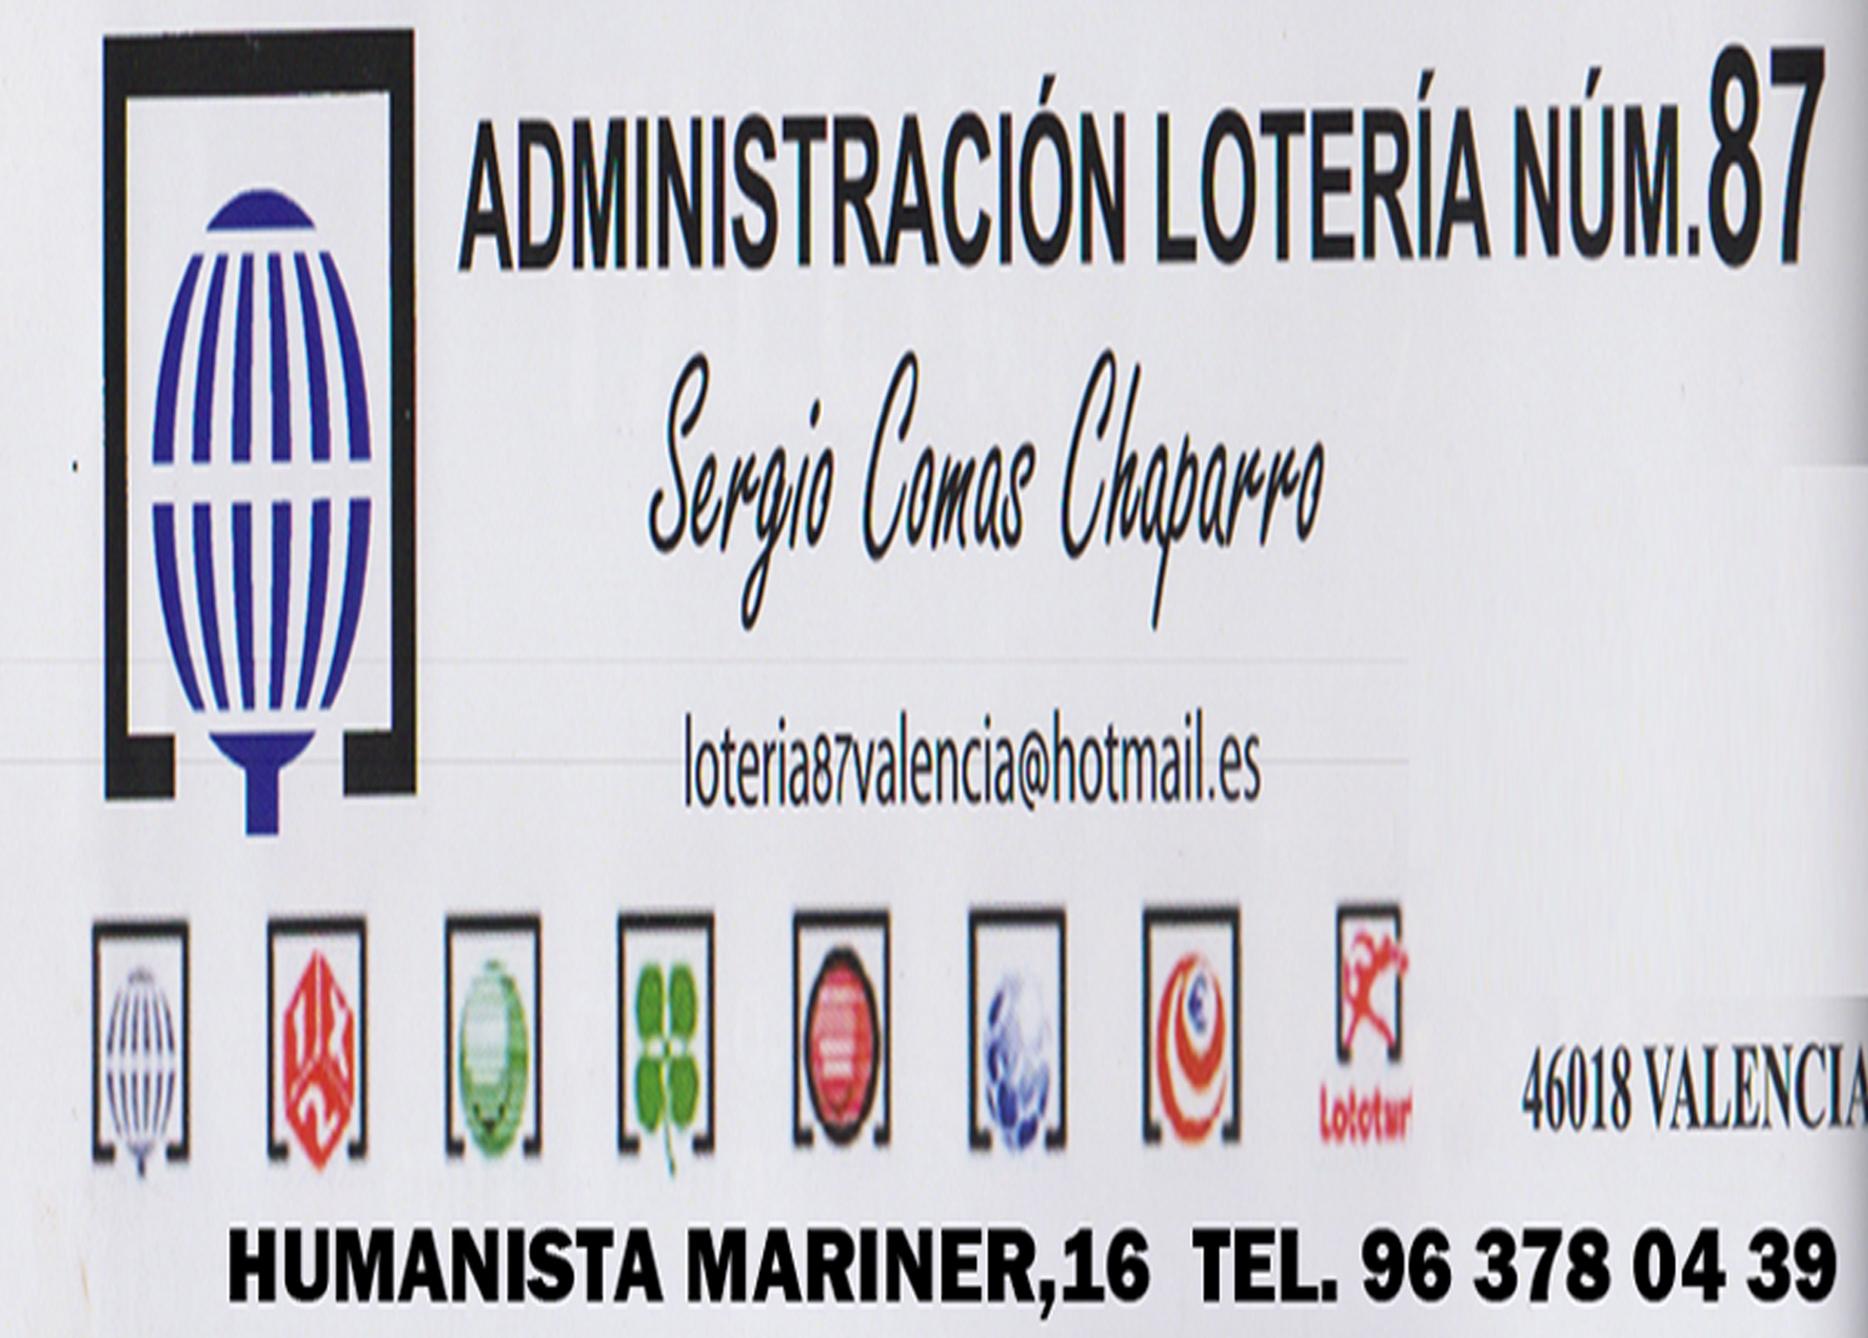 Administracion Loteria 87